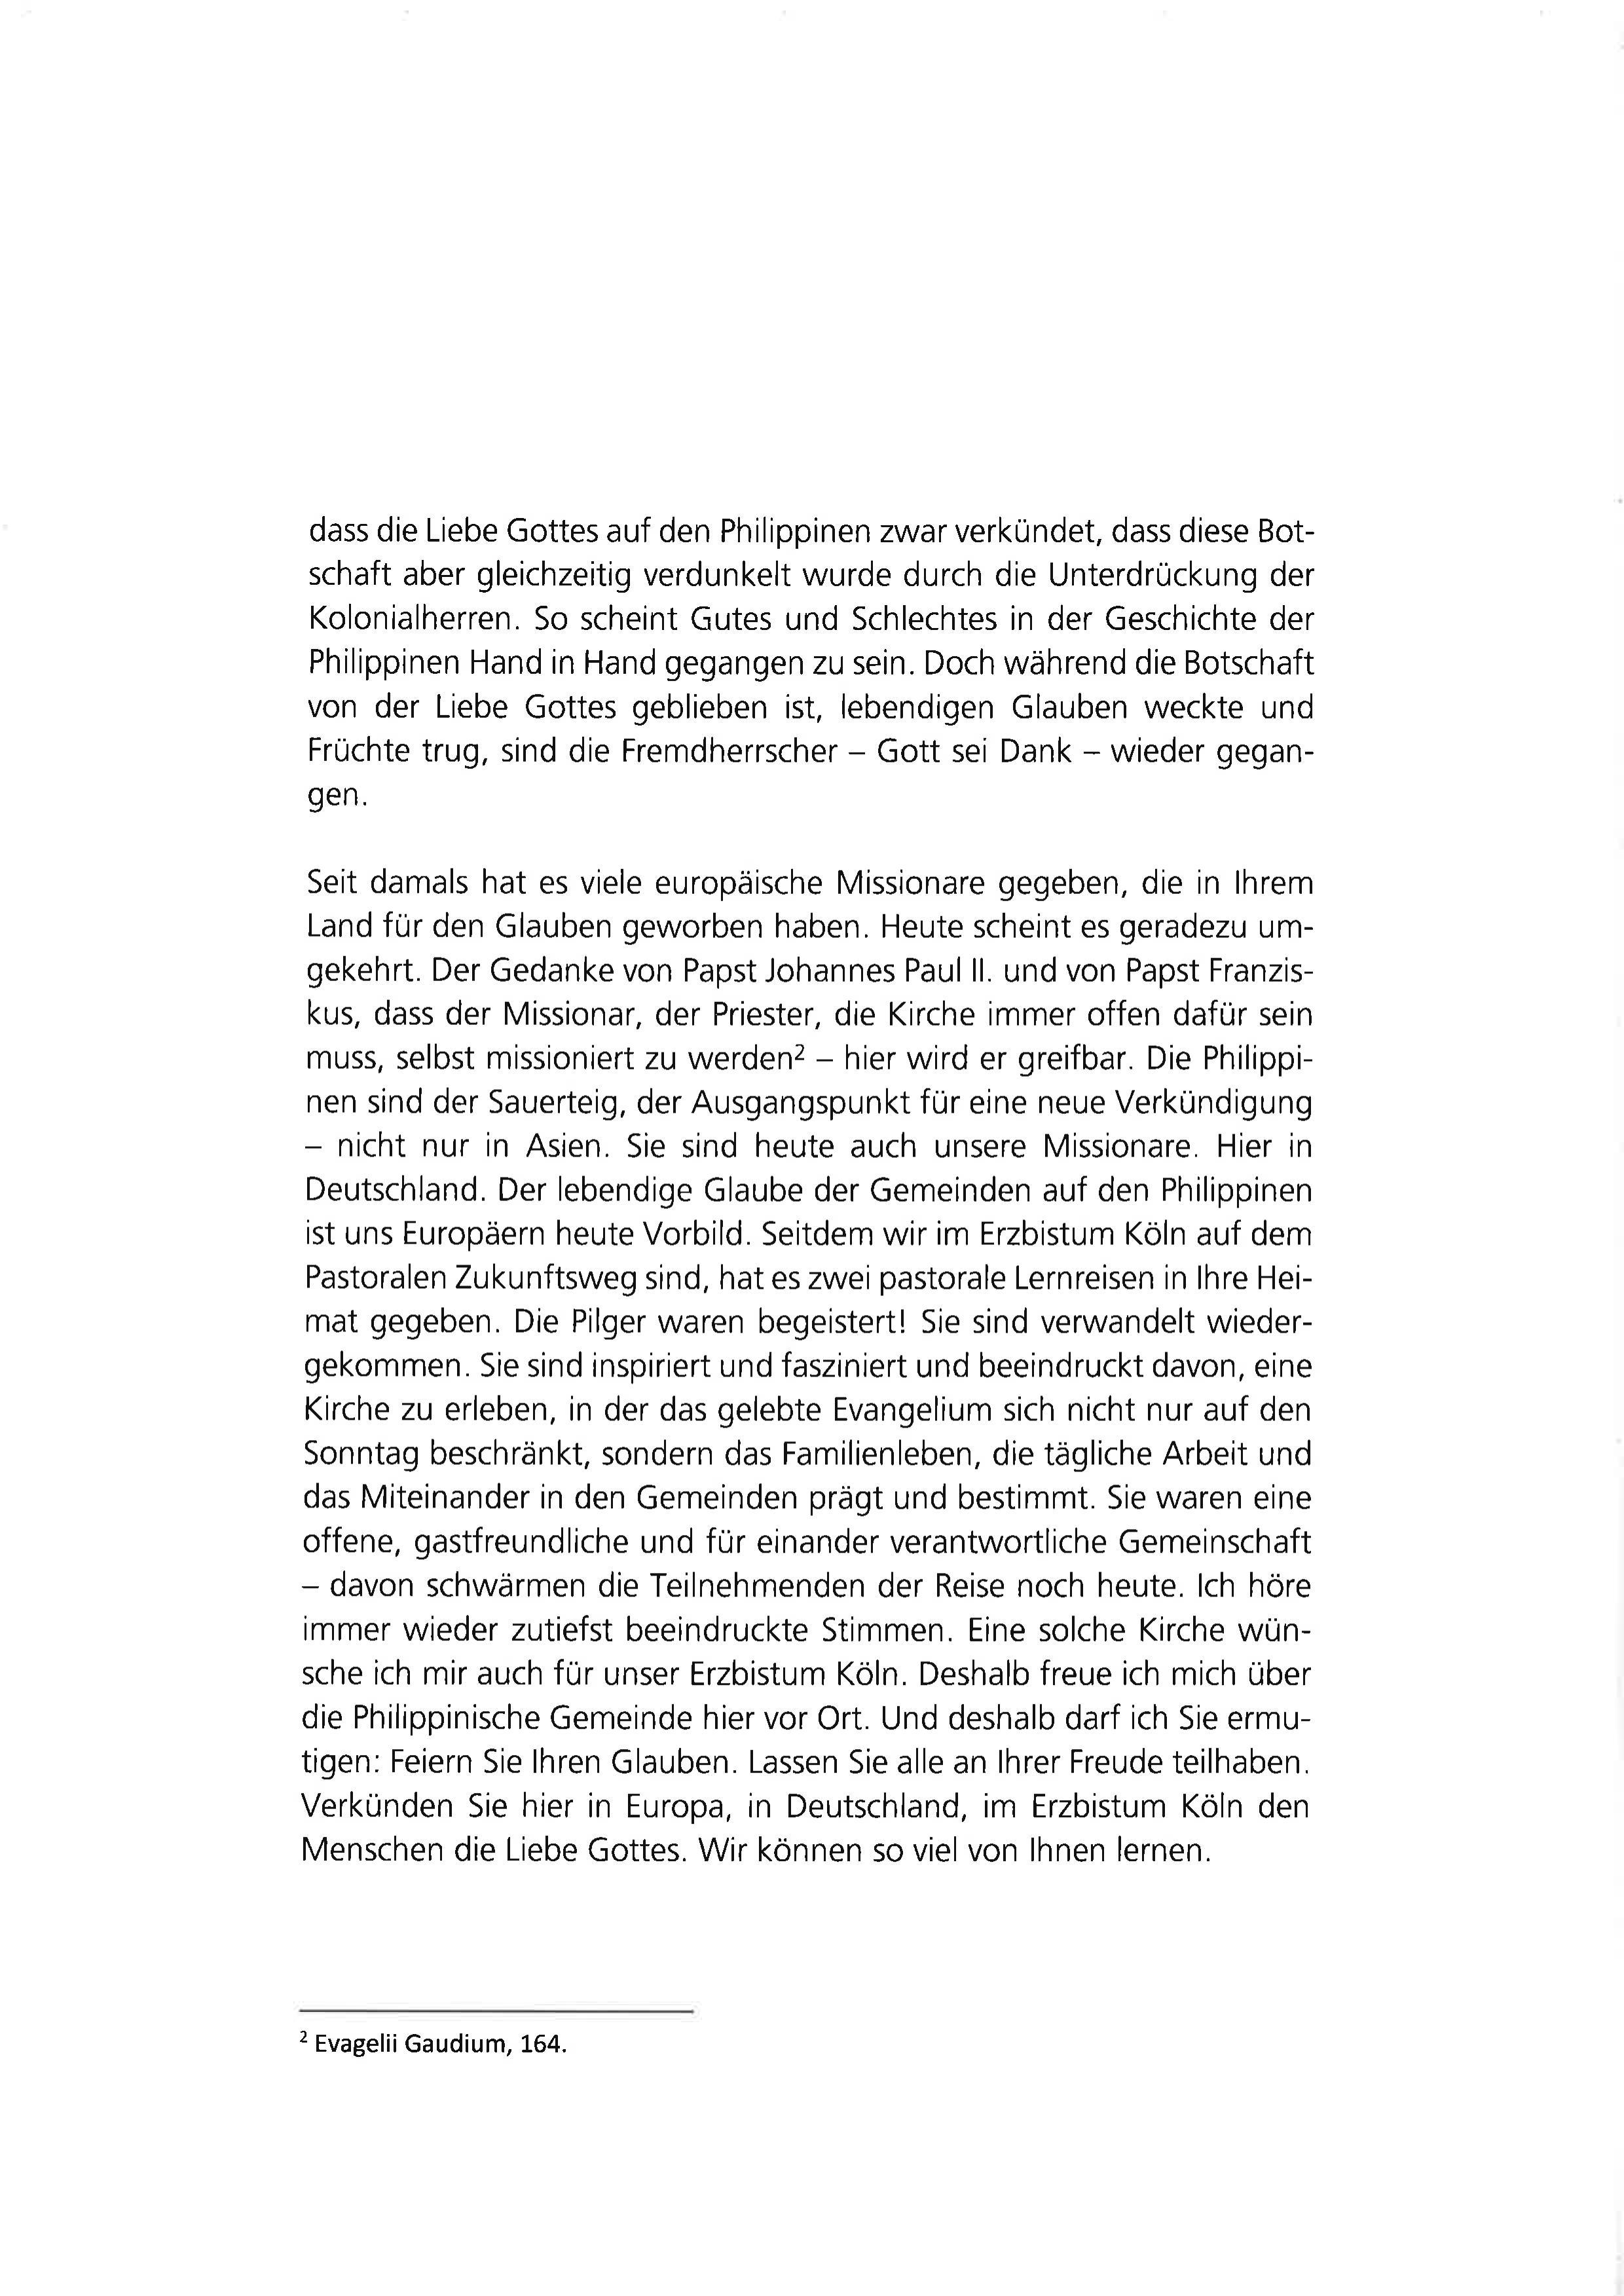 Grußwort Kardinal Rainer Maria Woelki_02